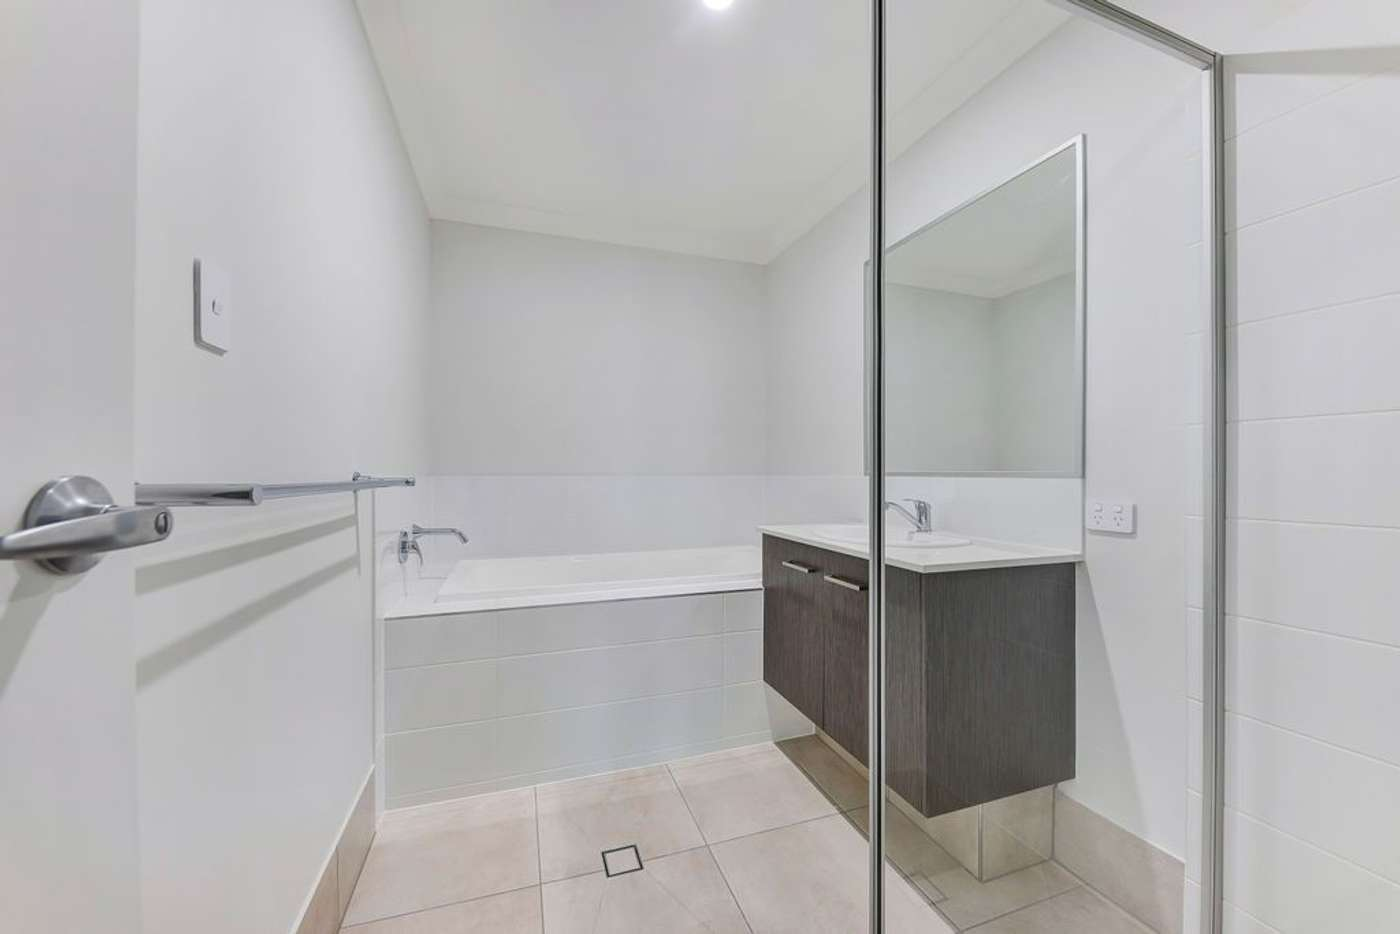 Sixth view of Homely unit listing, 10B Kurrajong Close, Mooloolah Valley QLD 4553